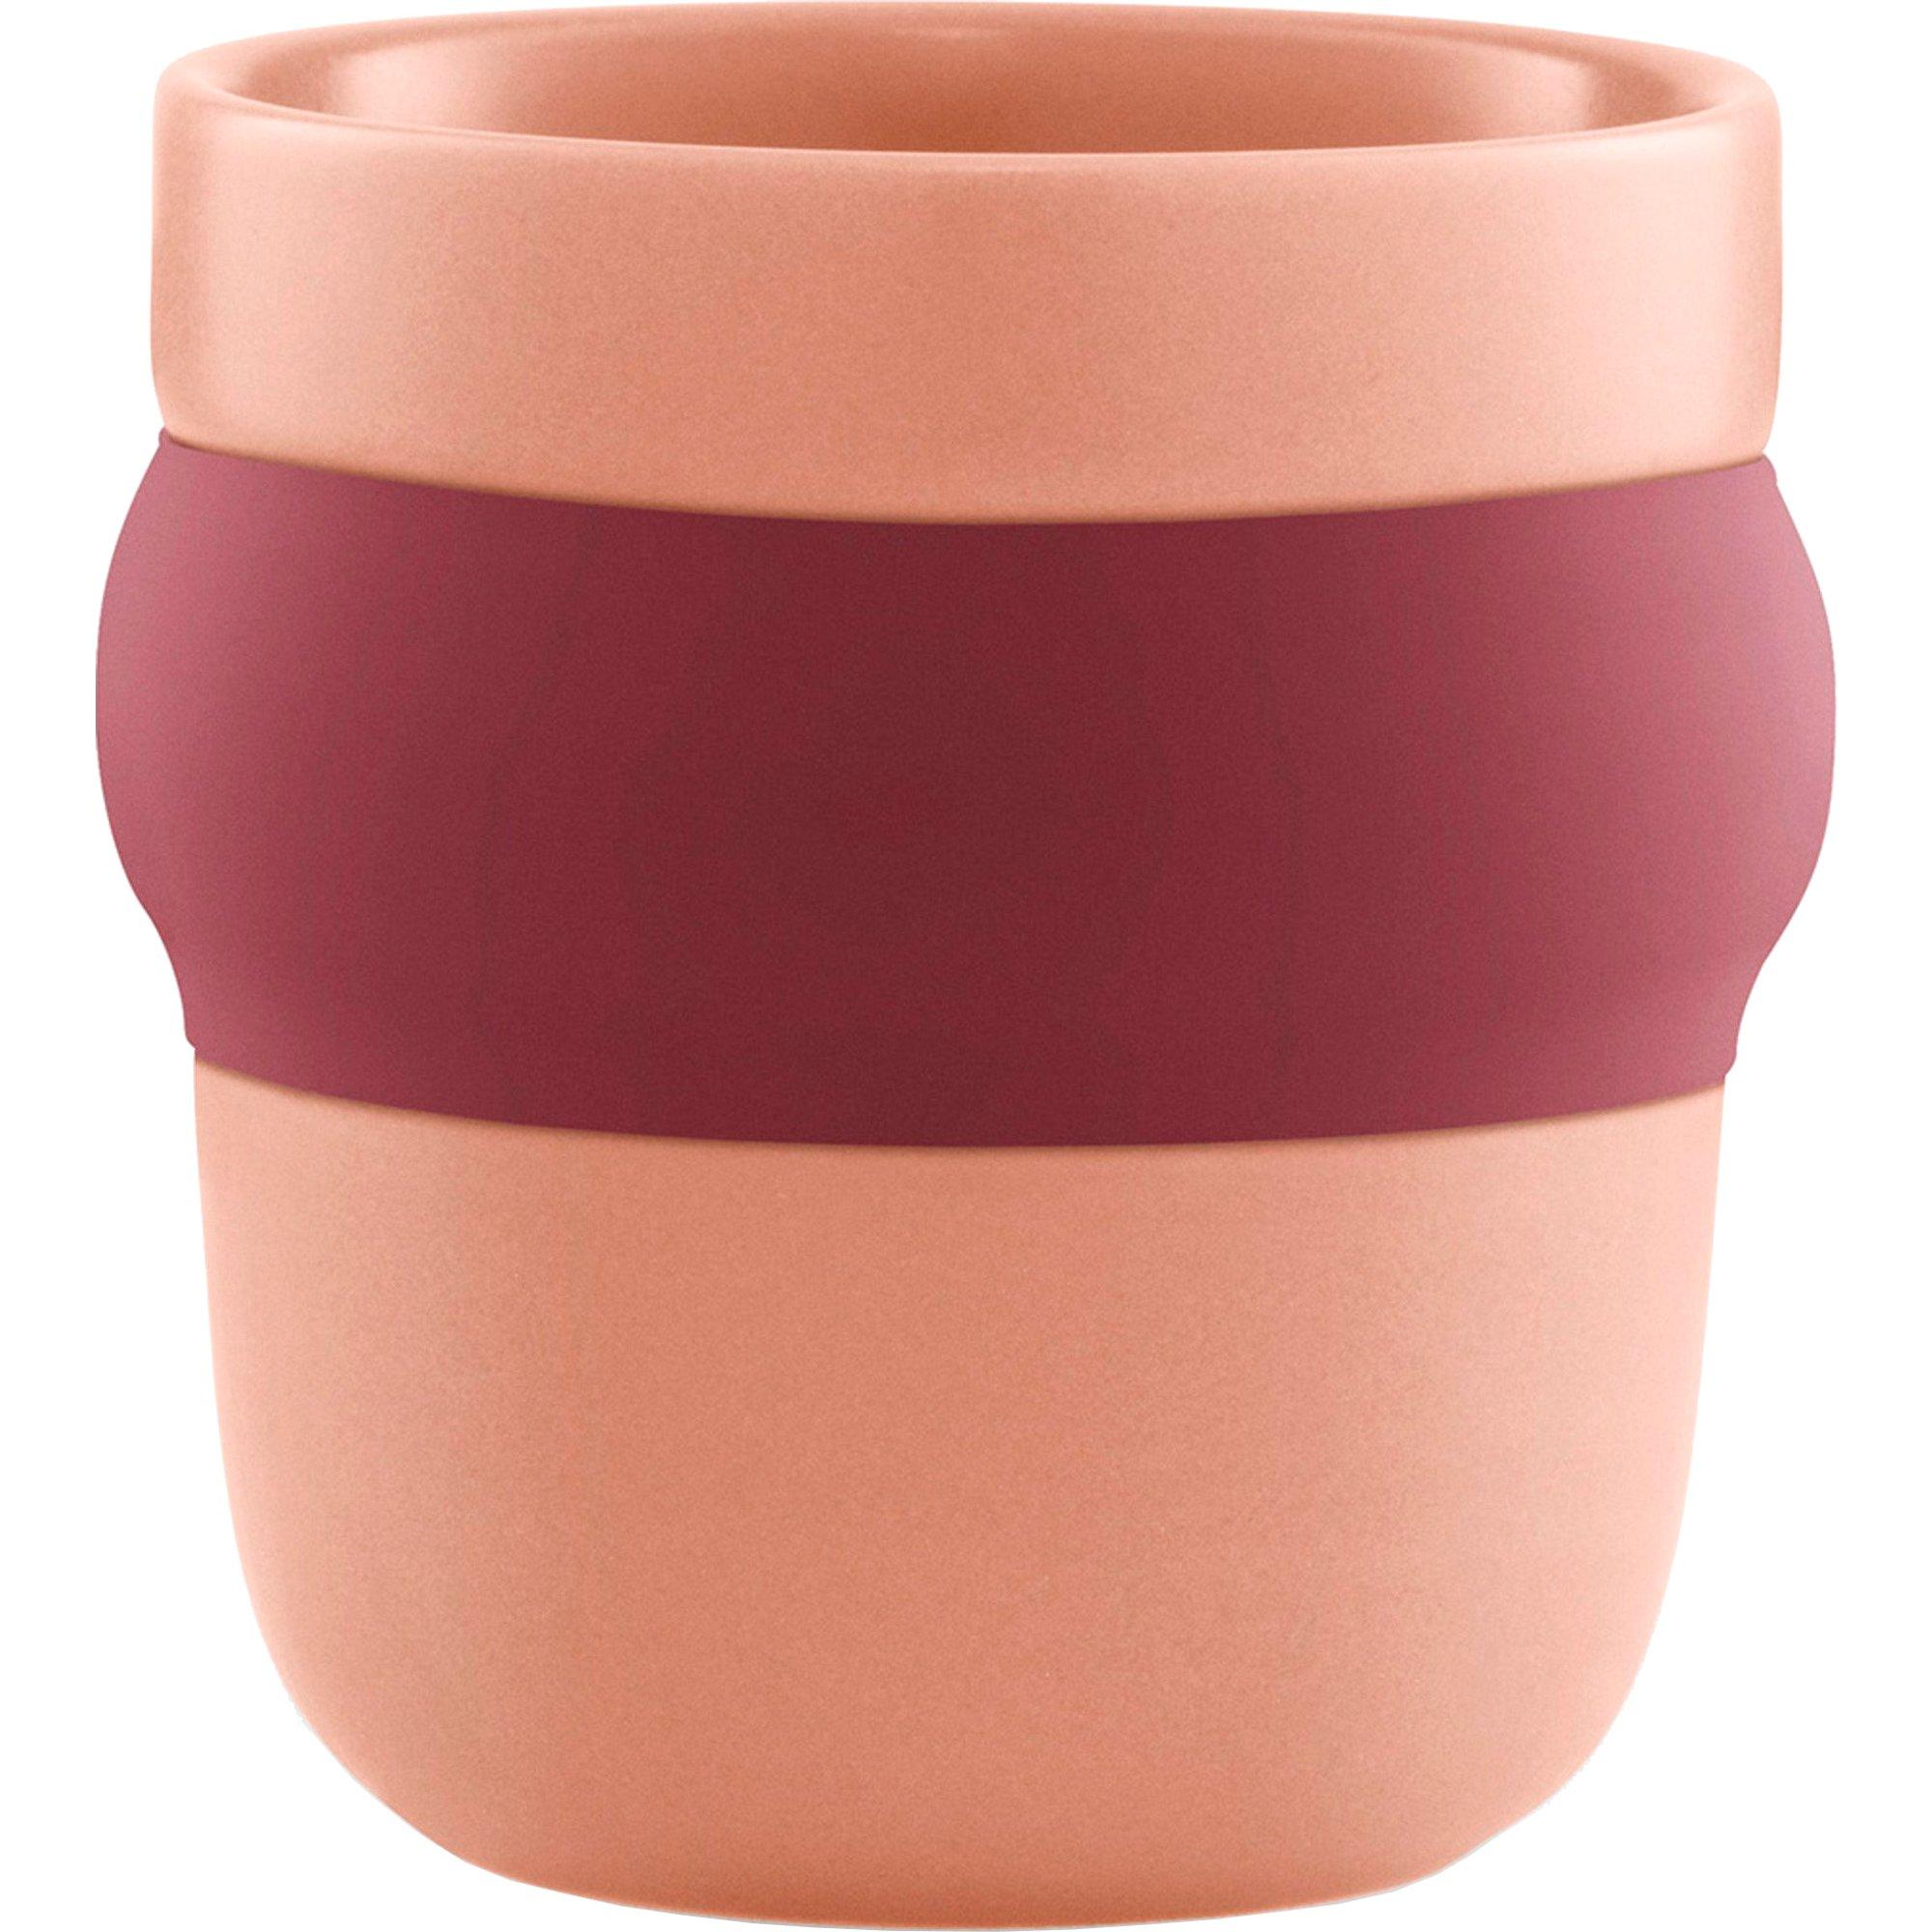 Normann Copenhagen Obi Espresso Cup